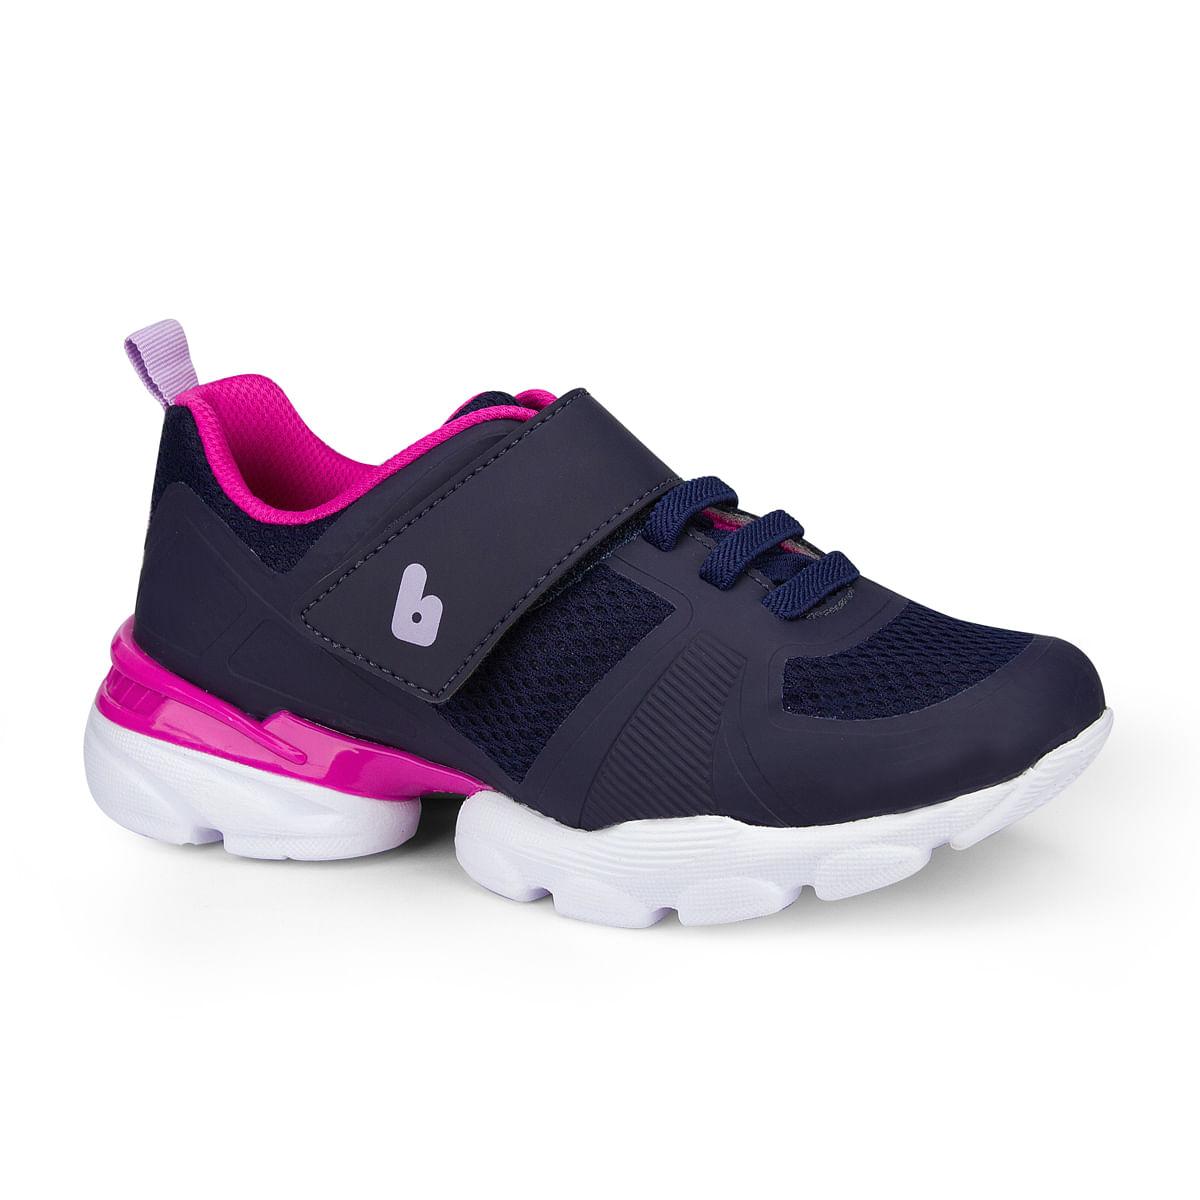 c9fa3dfb1c1 Tênis Infantil Bibi Feminino Rosa Drop New 983132 - Bibi Calçados